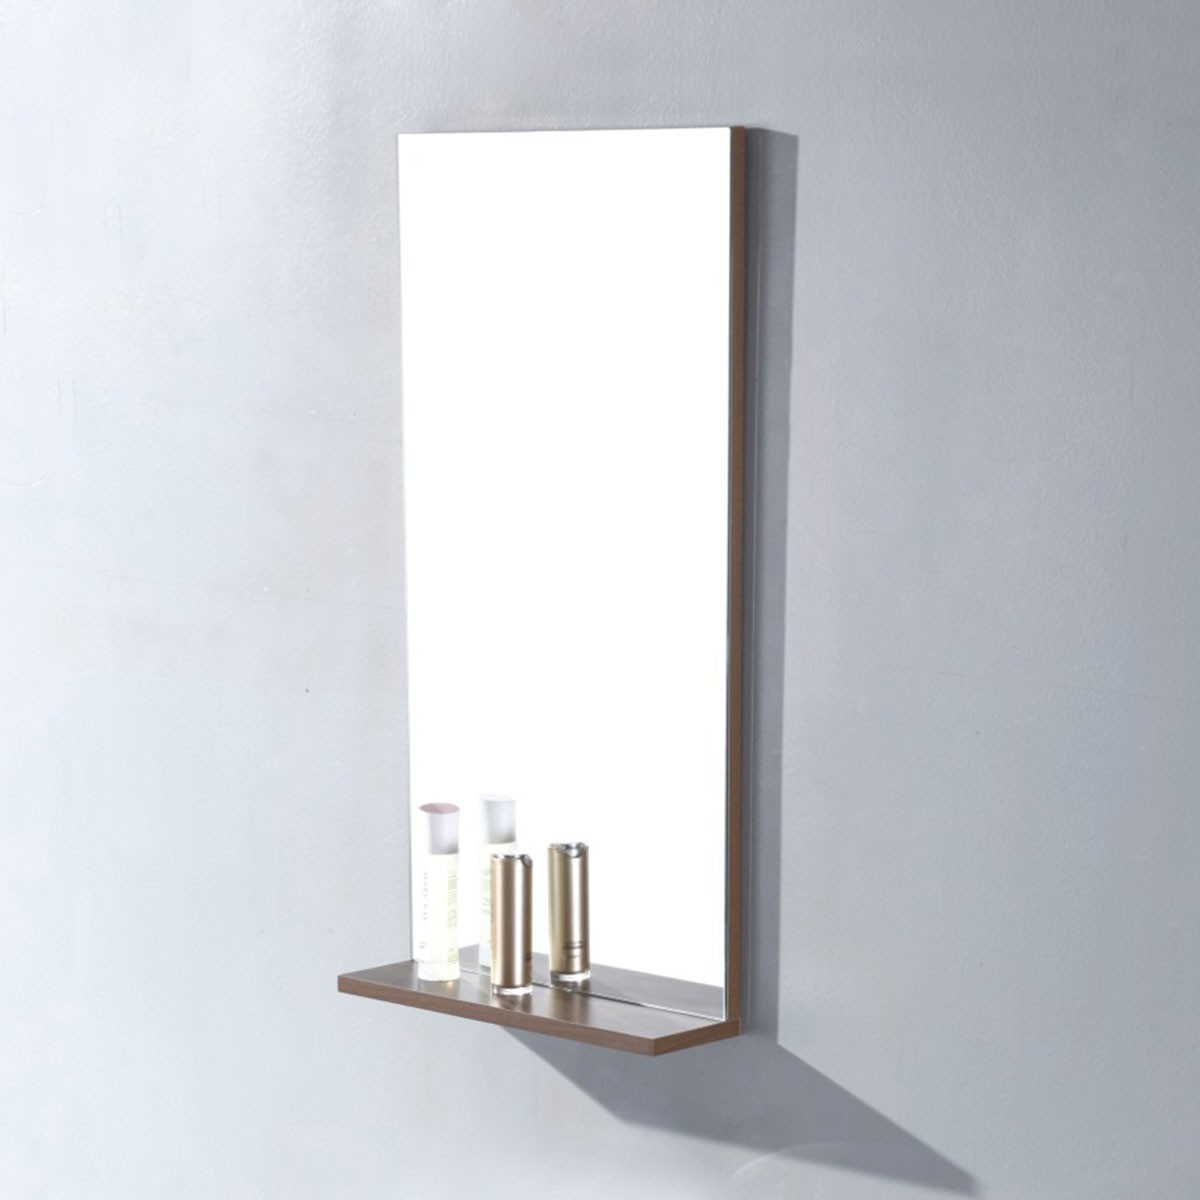 16 x 32 In. Bathroom Mirror with Shelf (MS400D-M)